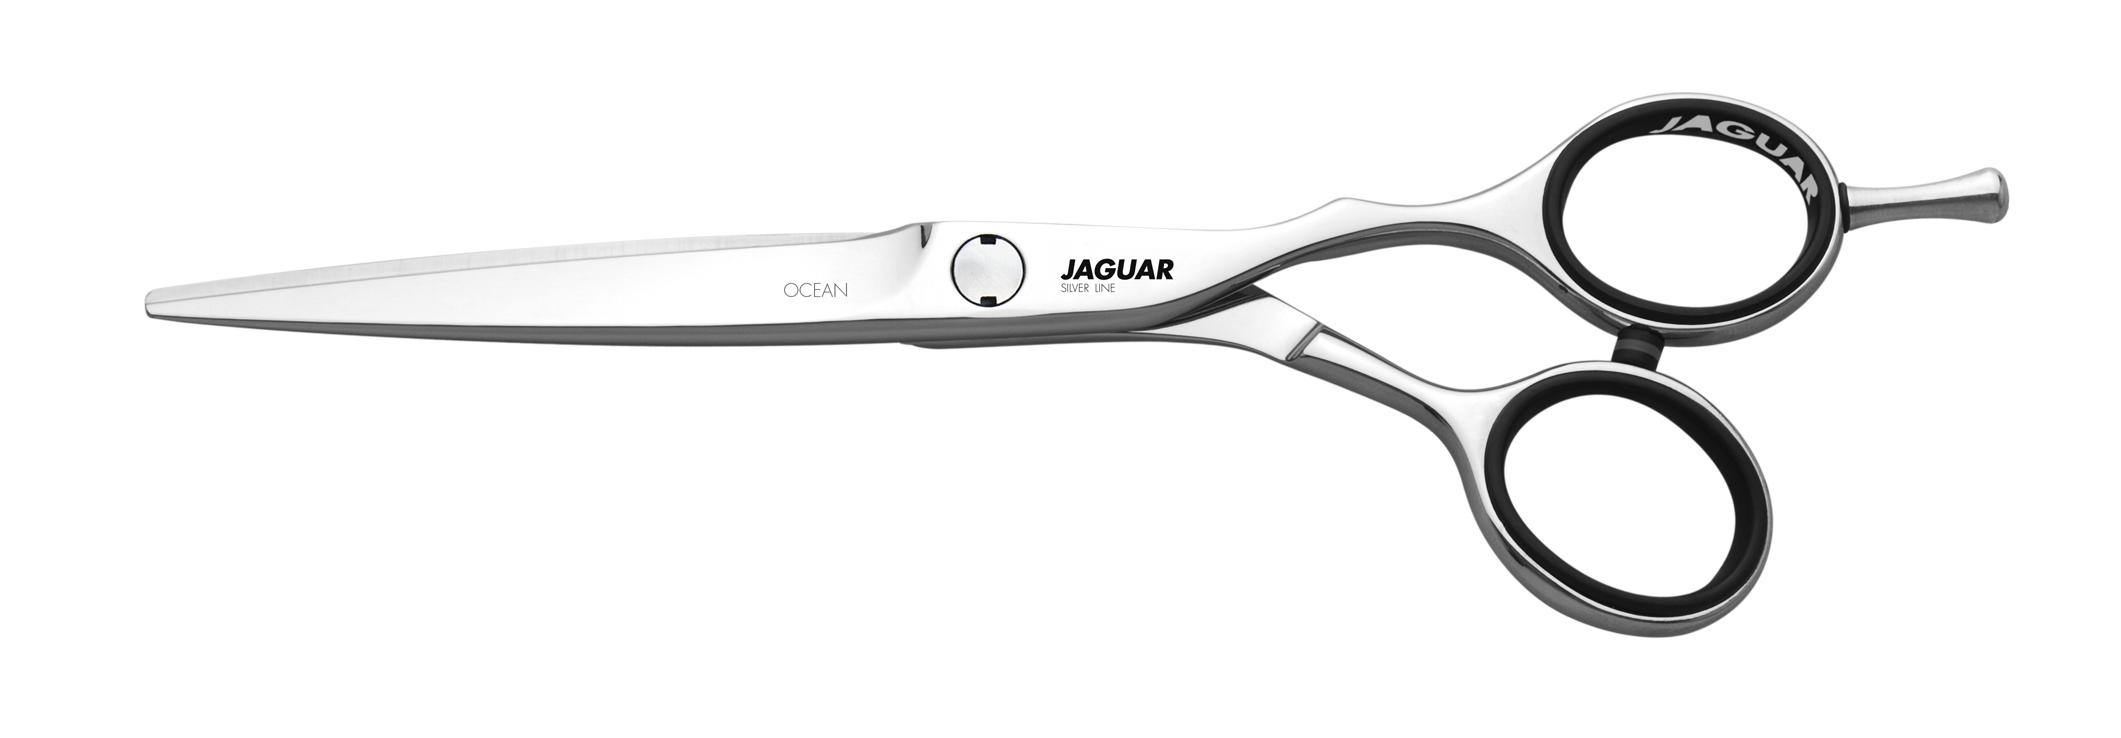 JAGUAR Ножницы A Ocean 5.25' *** jaguar ножницы jaguar silence 6 15 5cm gl